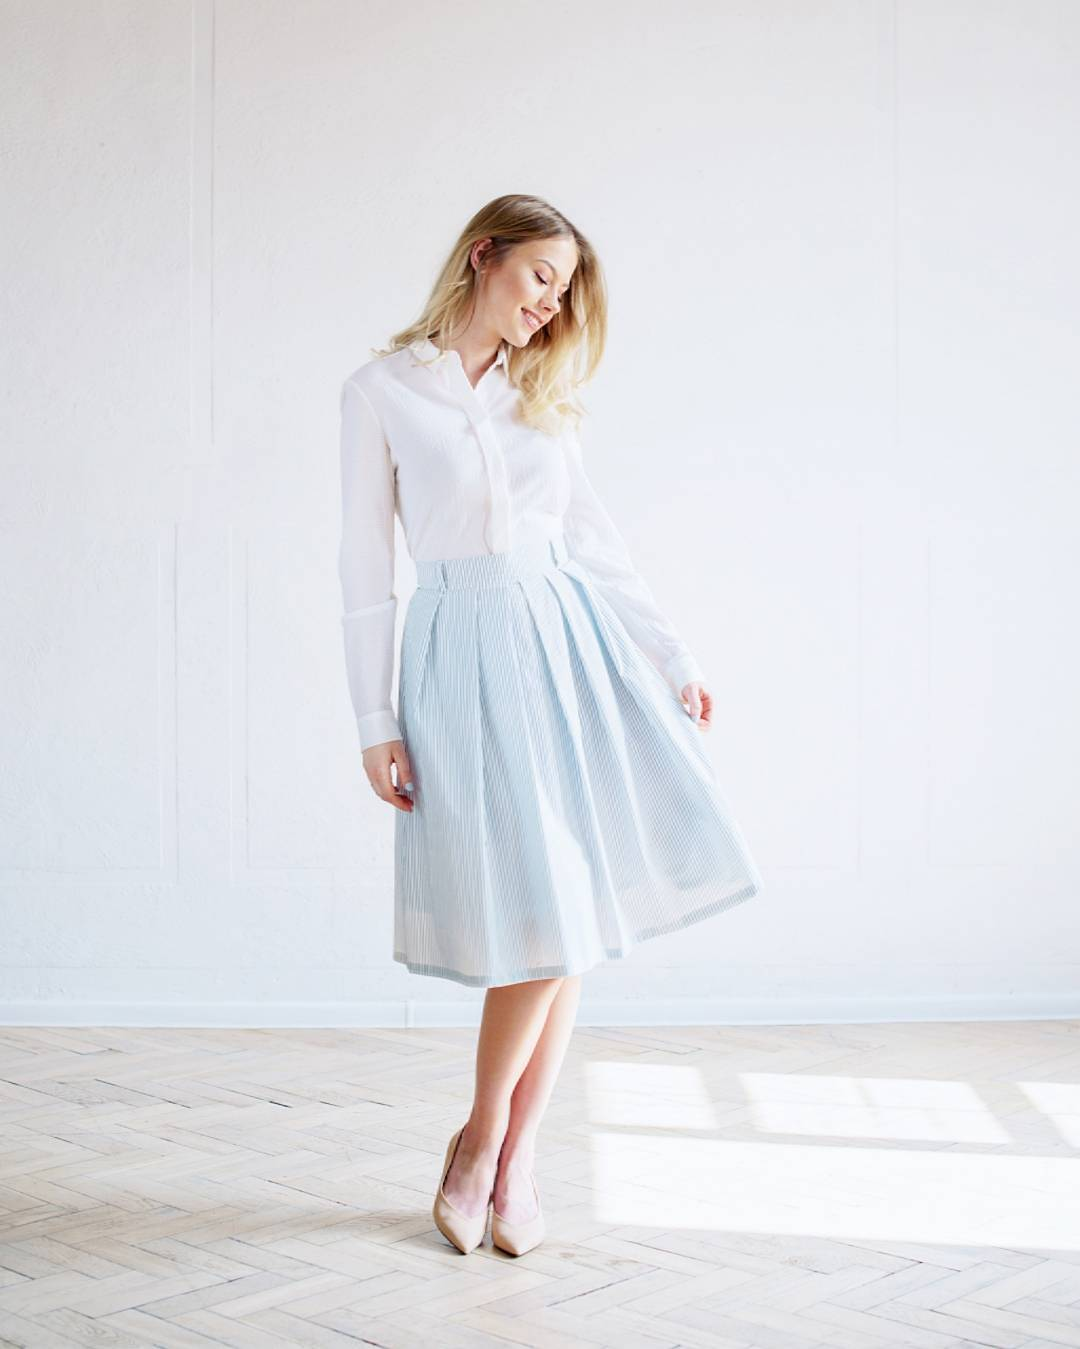 church dress women white and blue